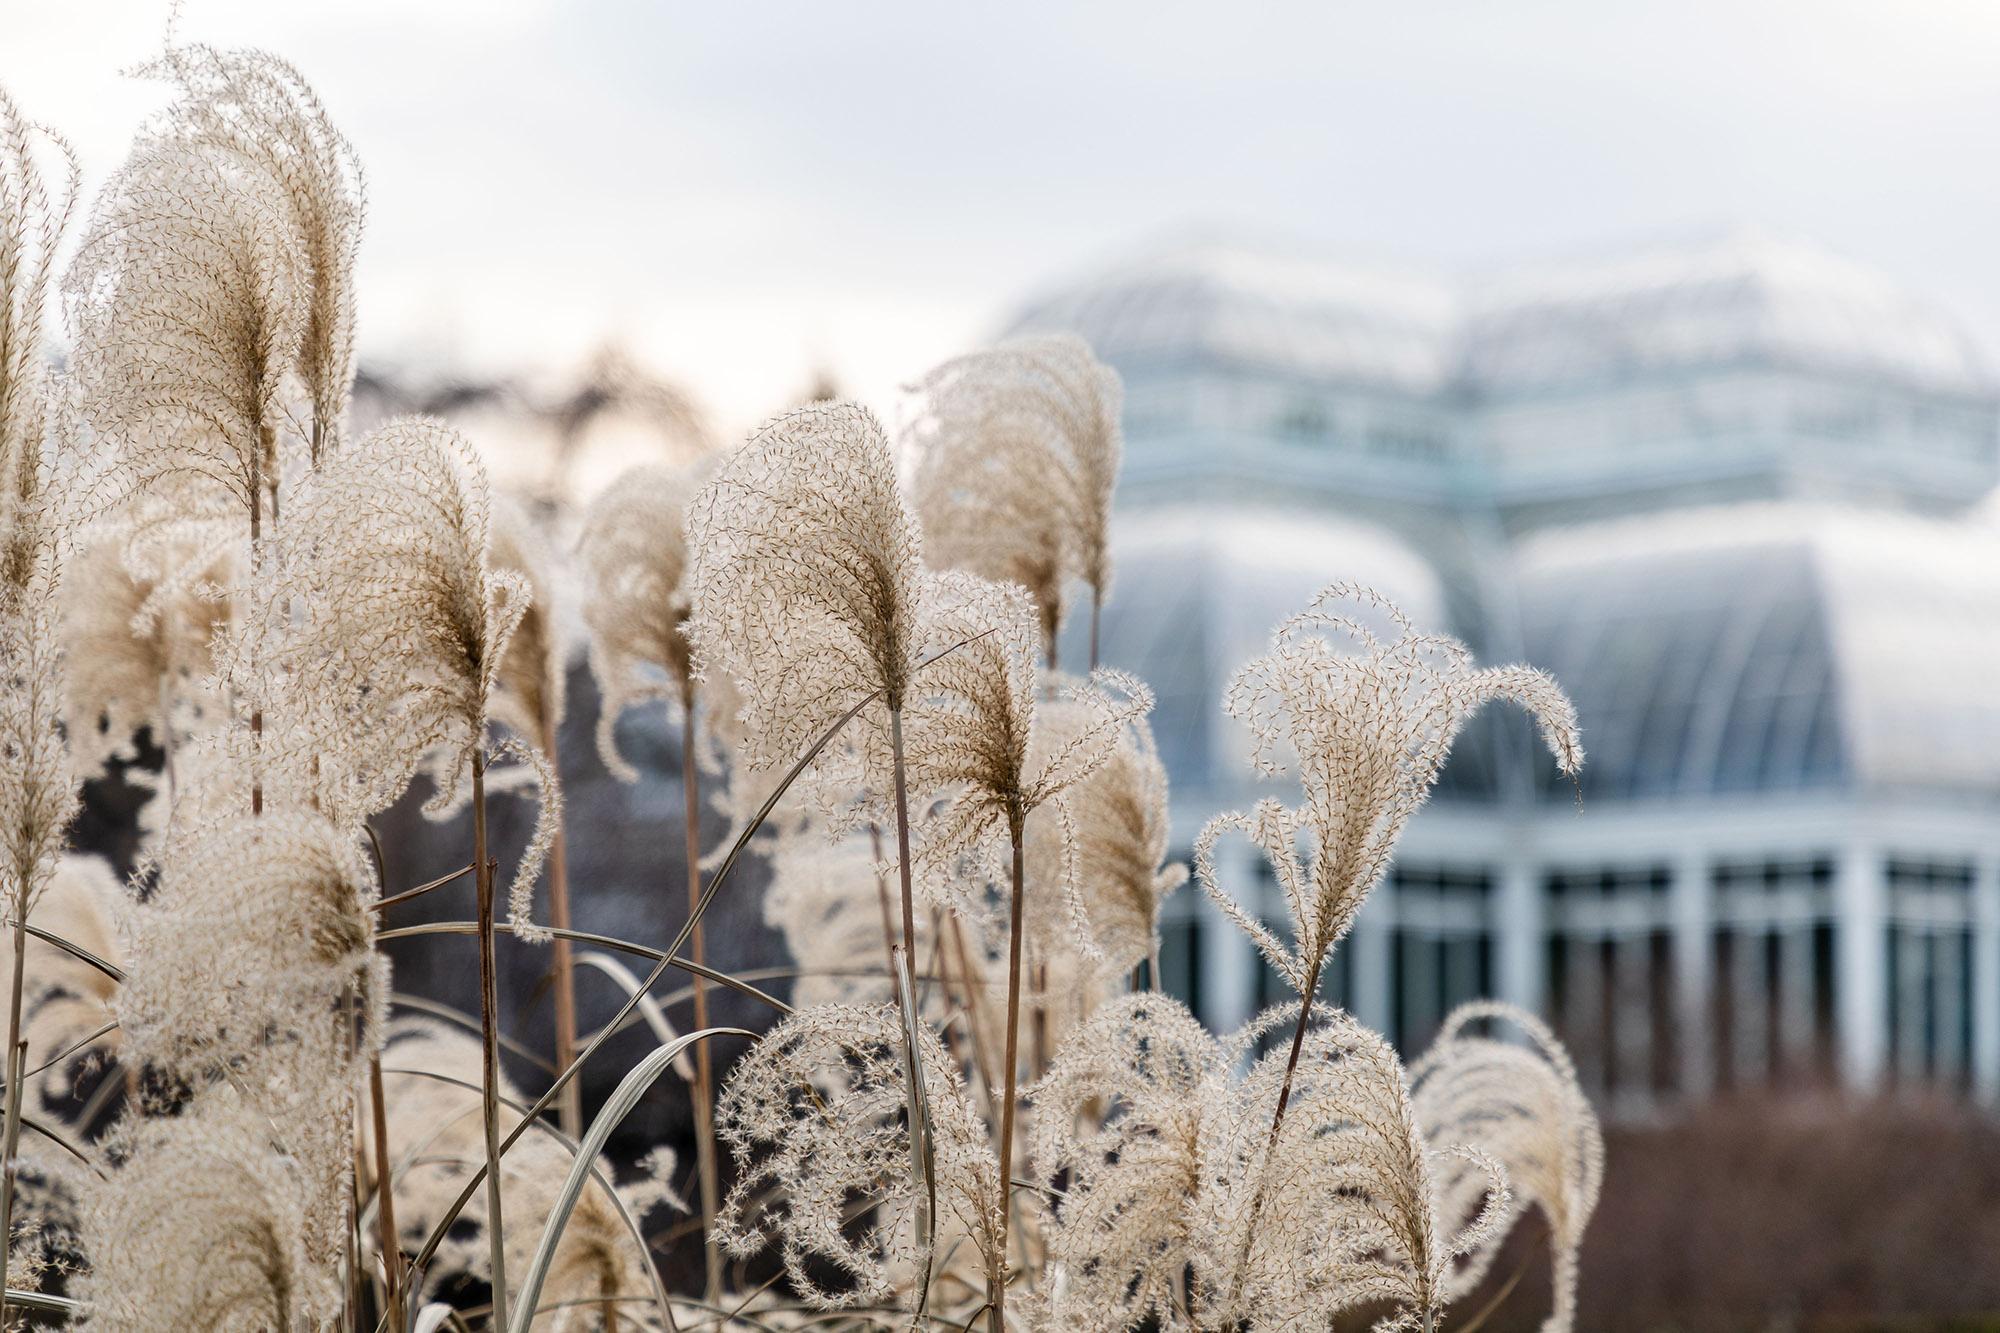 Japanese silver grass (<em>Miscanthus sinensis</em> var. <em>condensatus</em>)